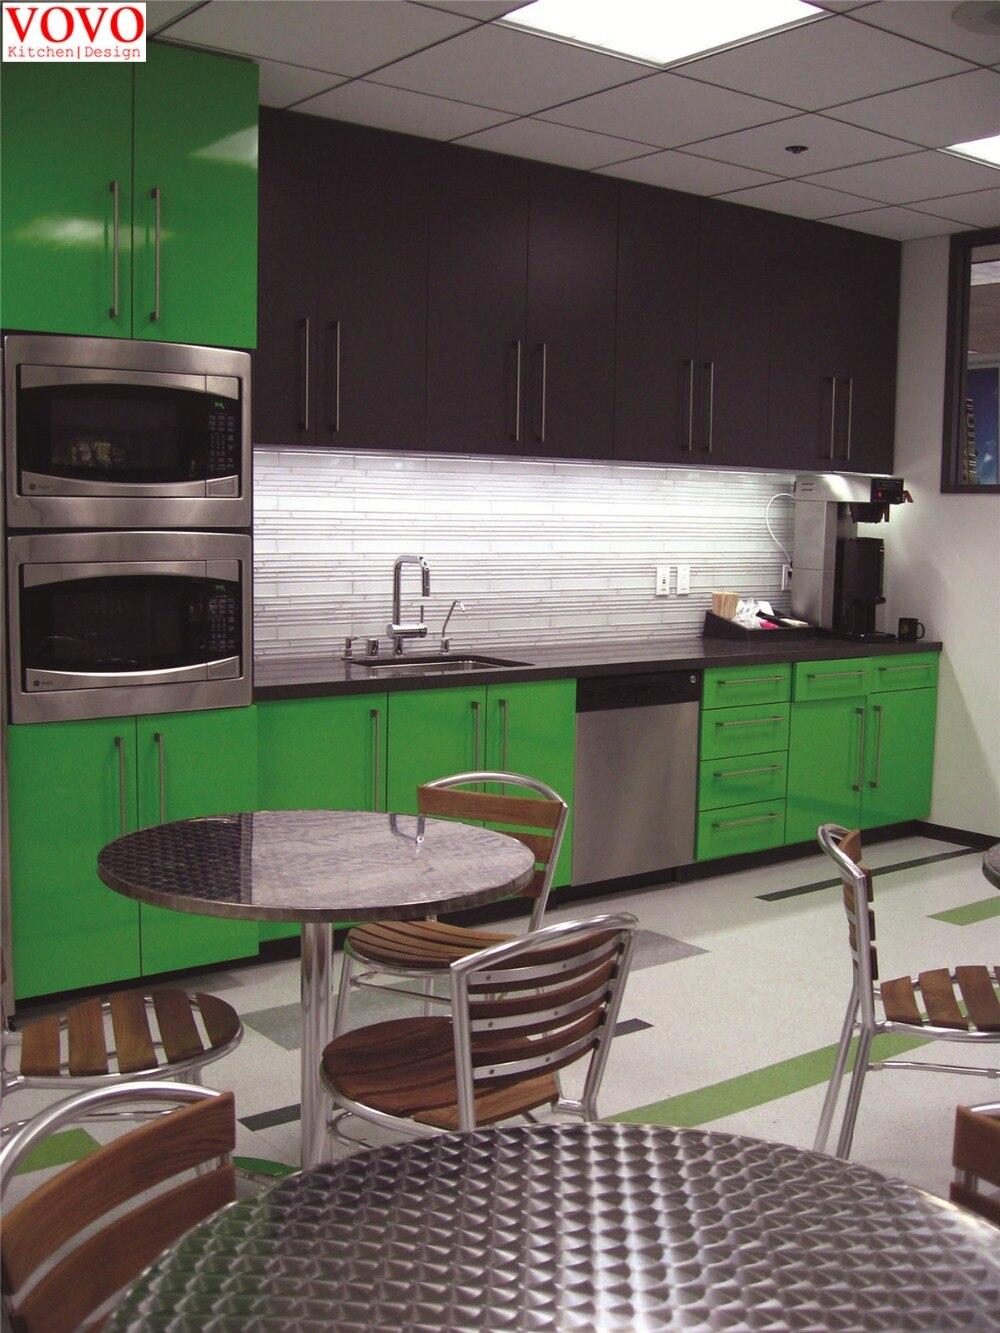 Online kopen Wholesale groene keukenkast uit China groene ...